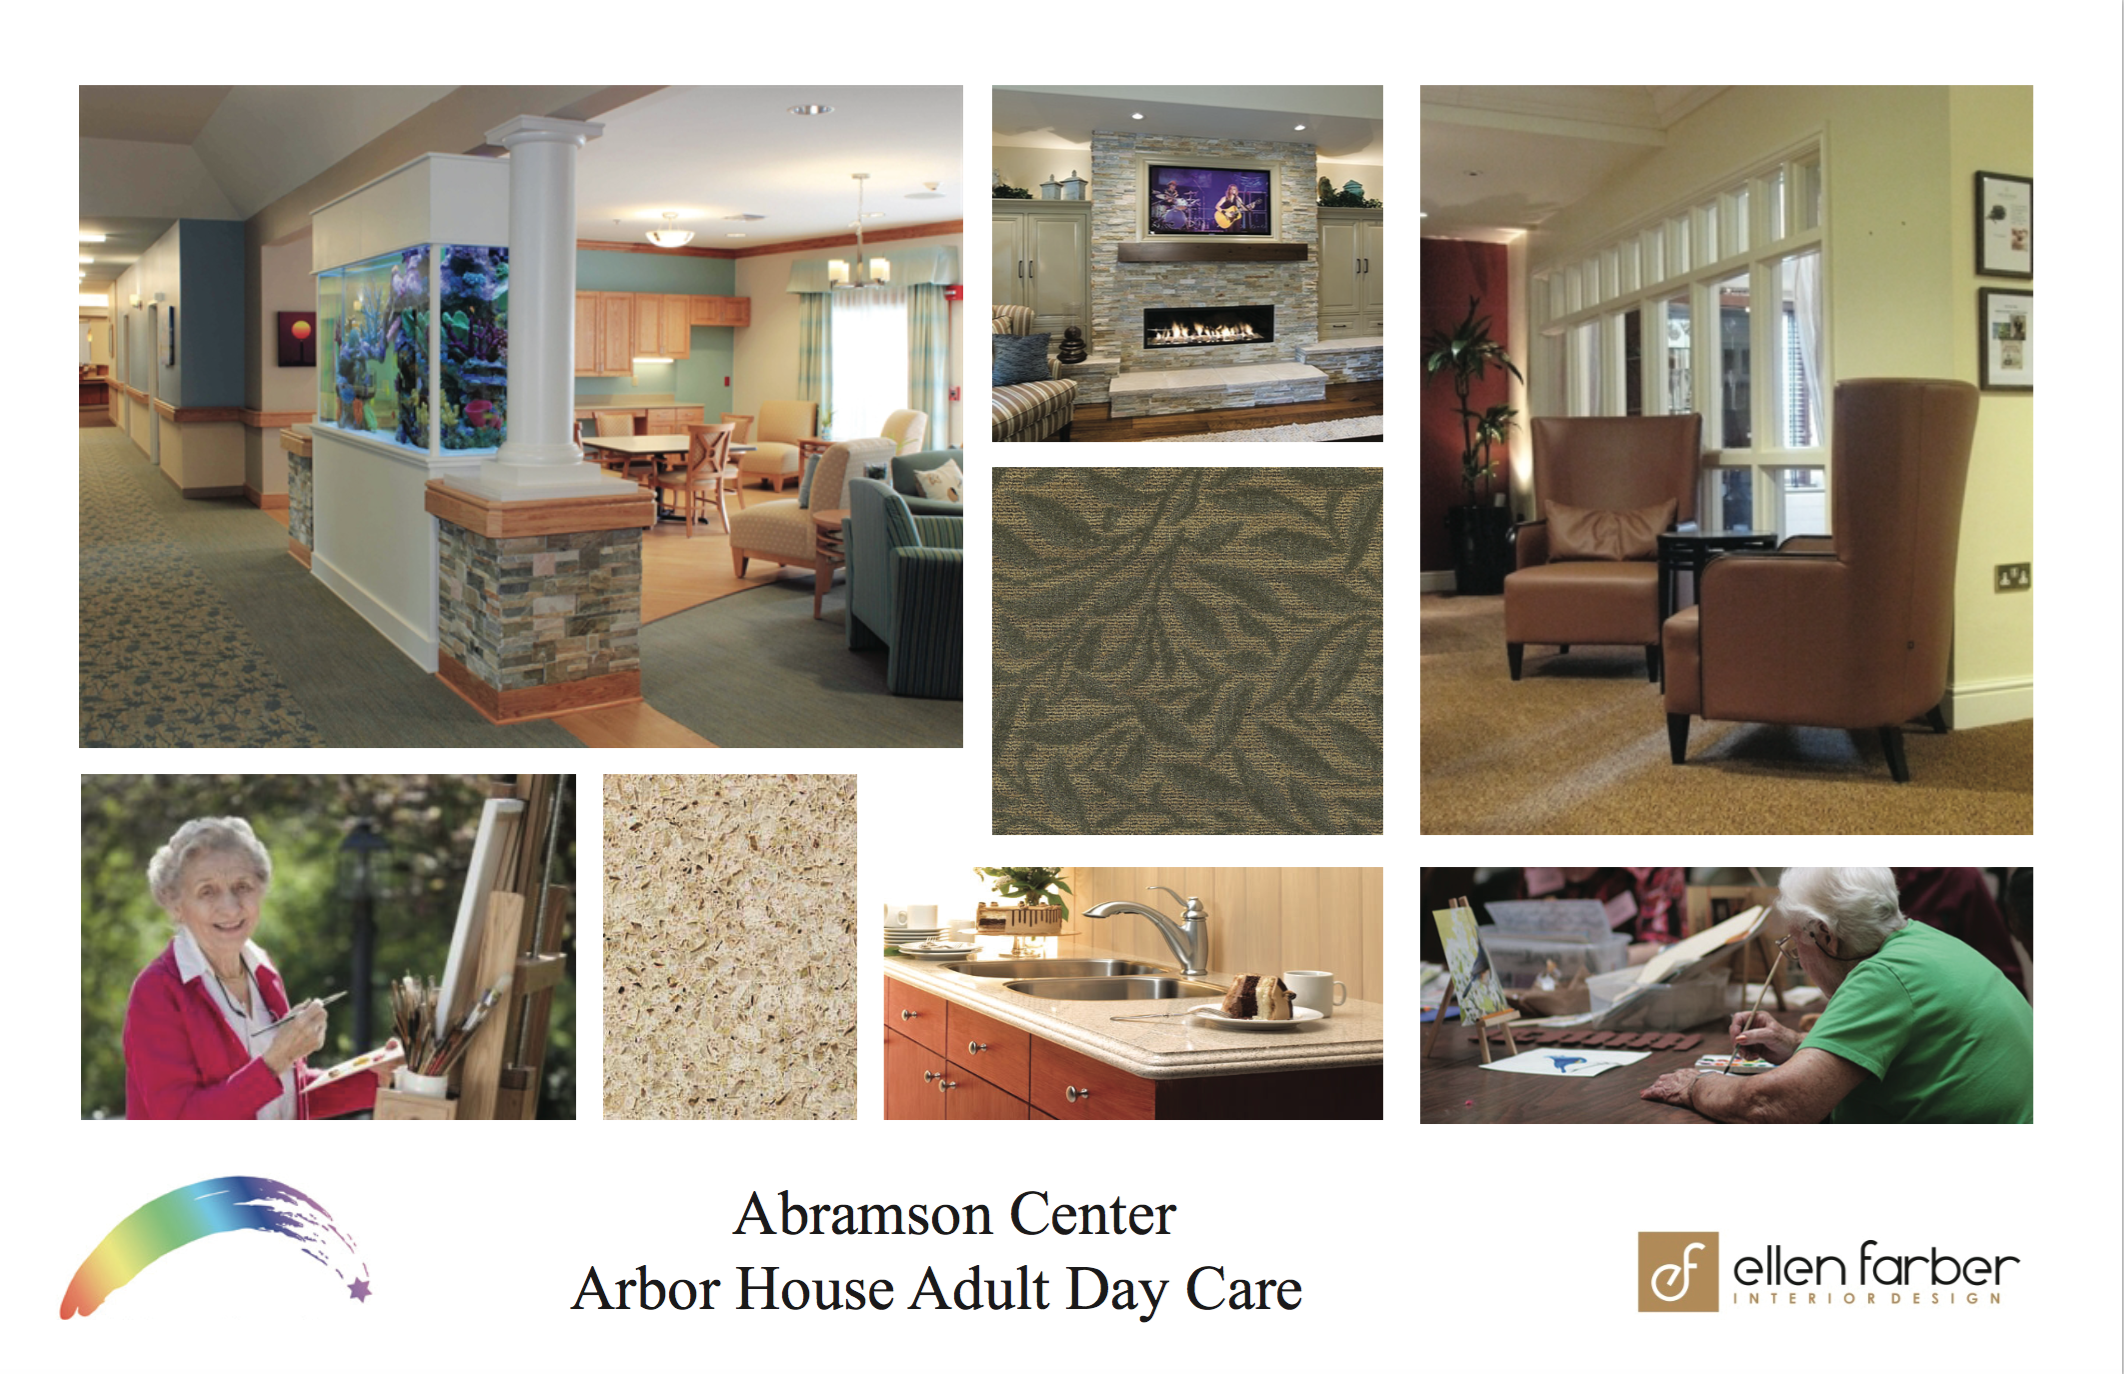 abranson center inpirs.png